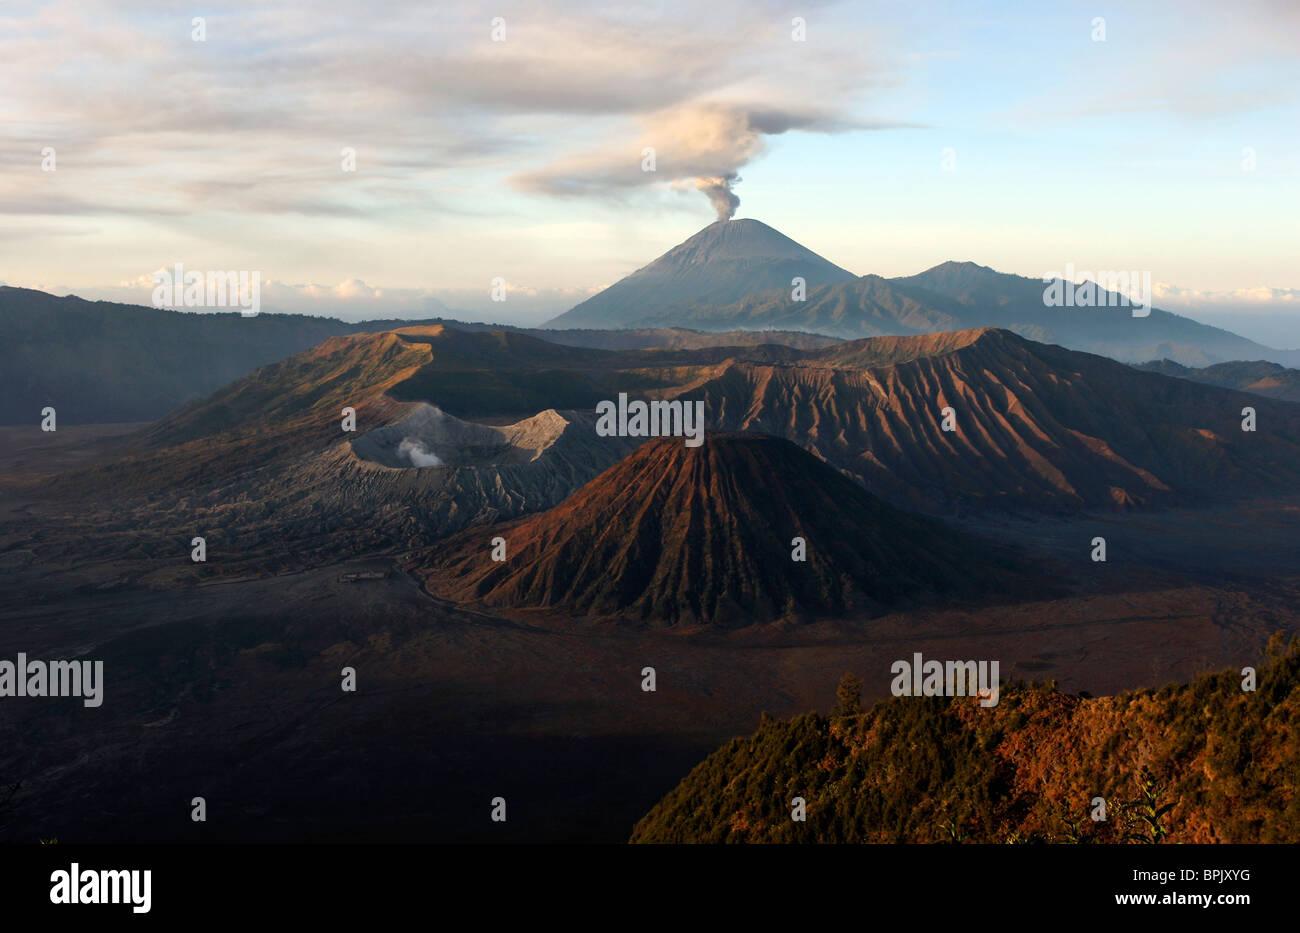 26. August 2005 - Tengger Caldera mit ausbrechenden Semeru, Insel Java, Indonesien. Stockbild